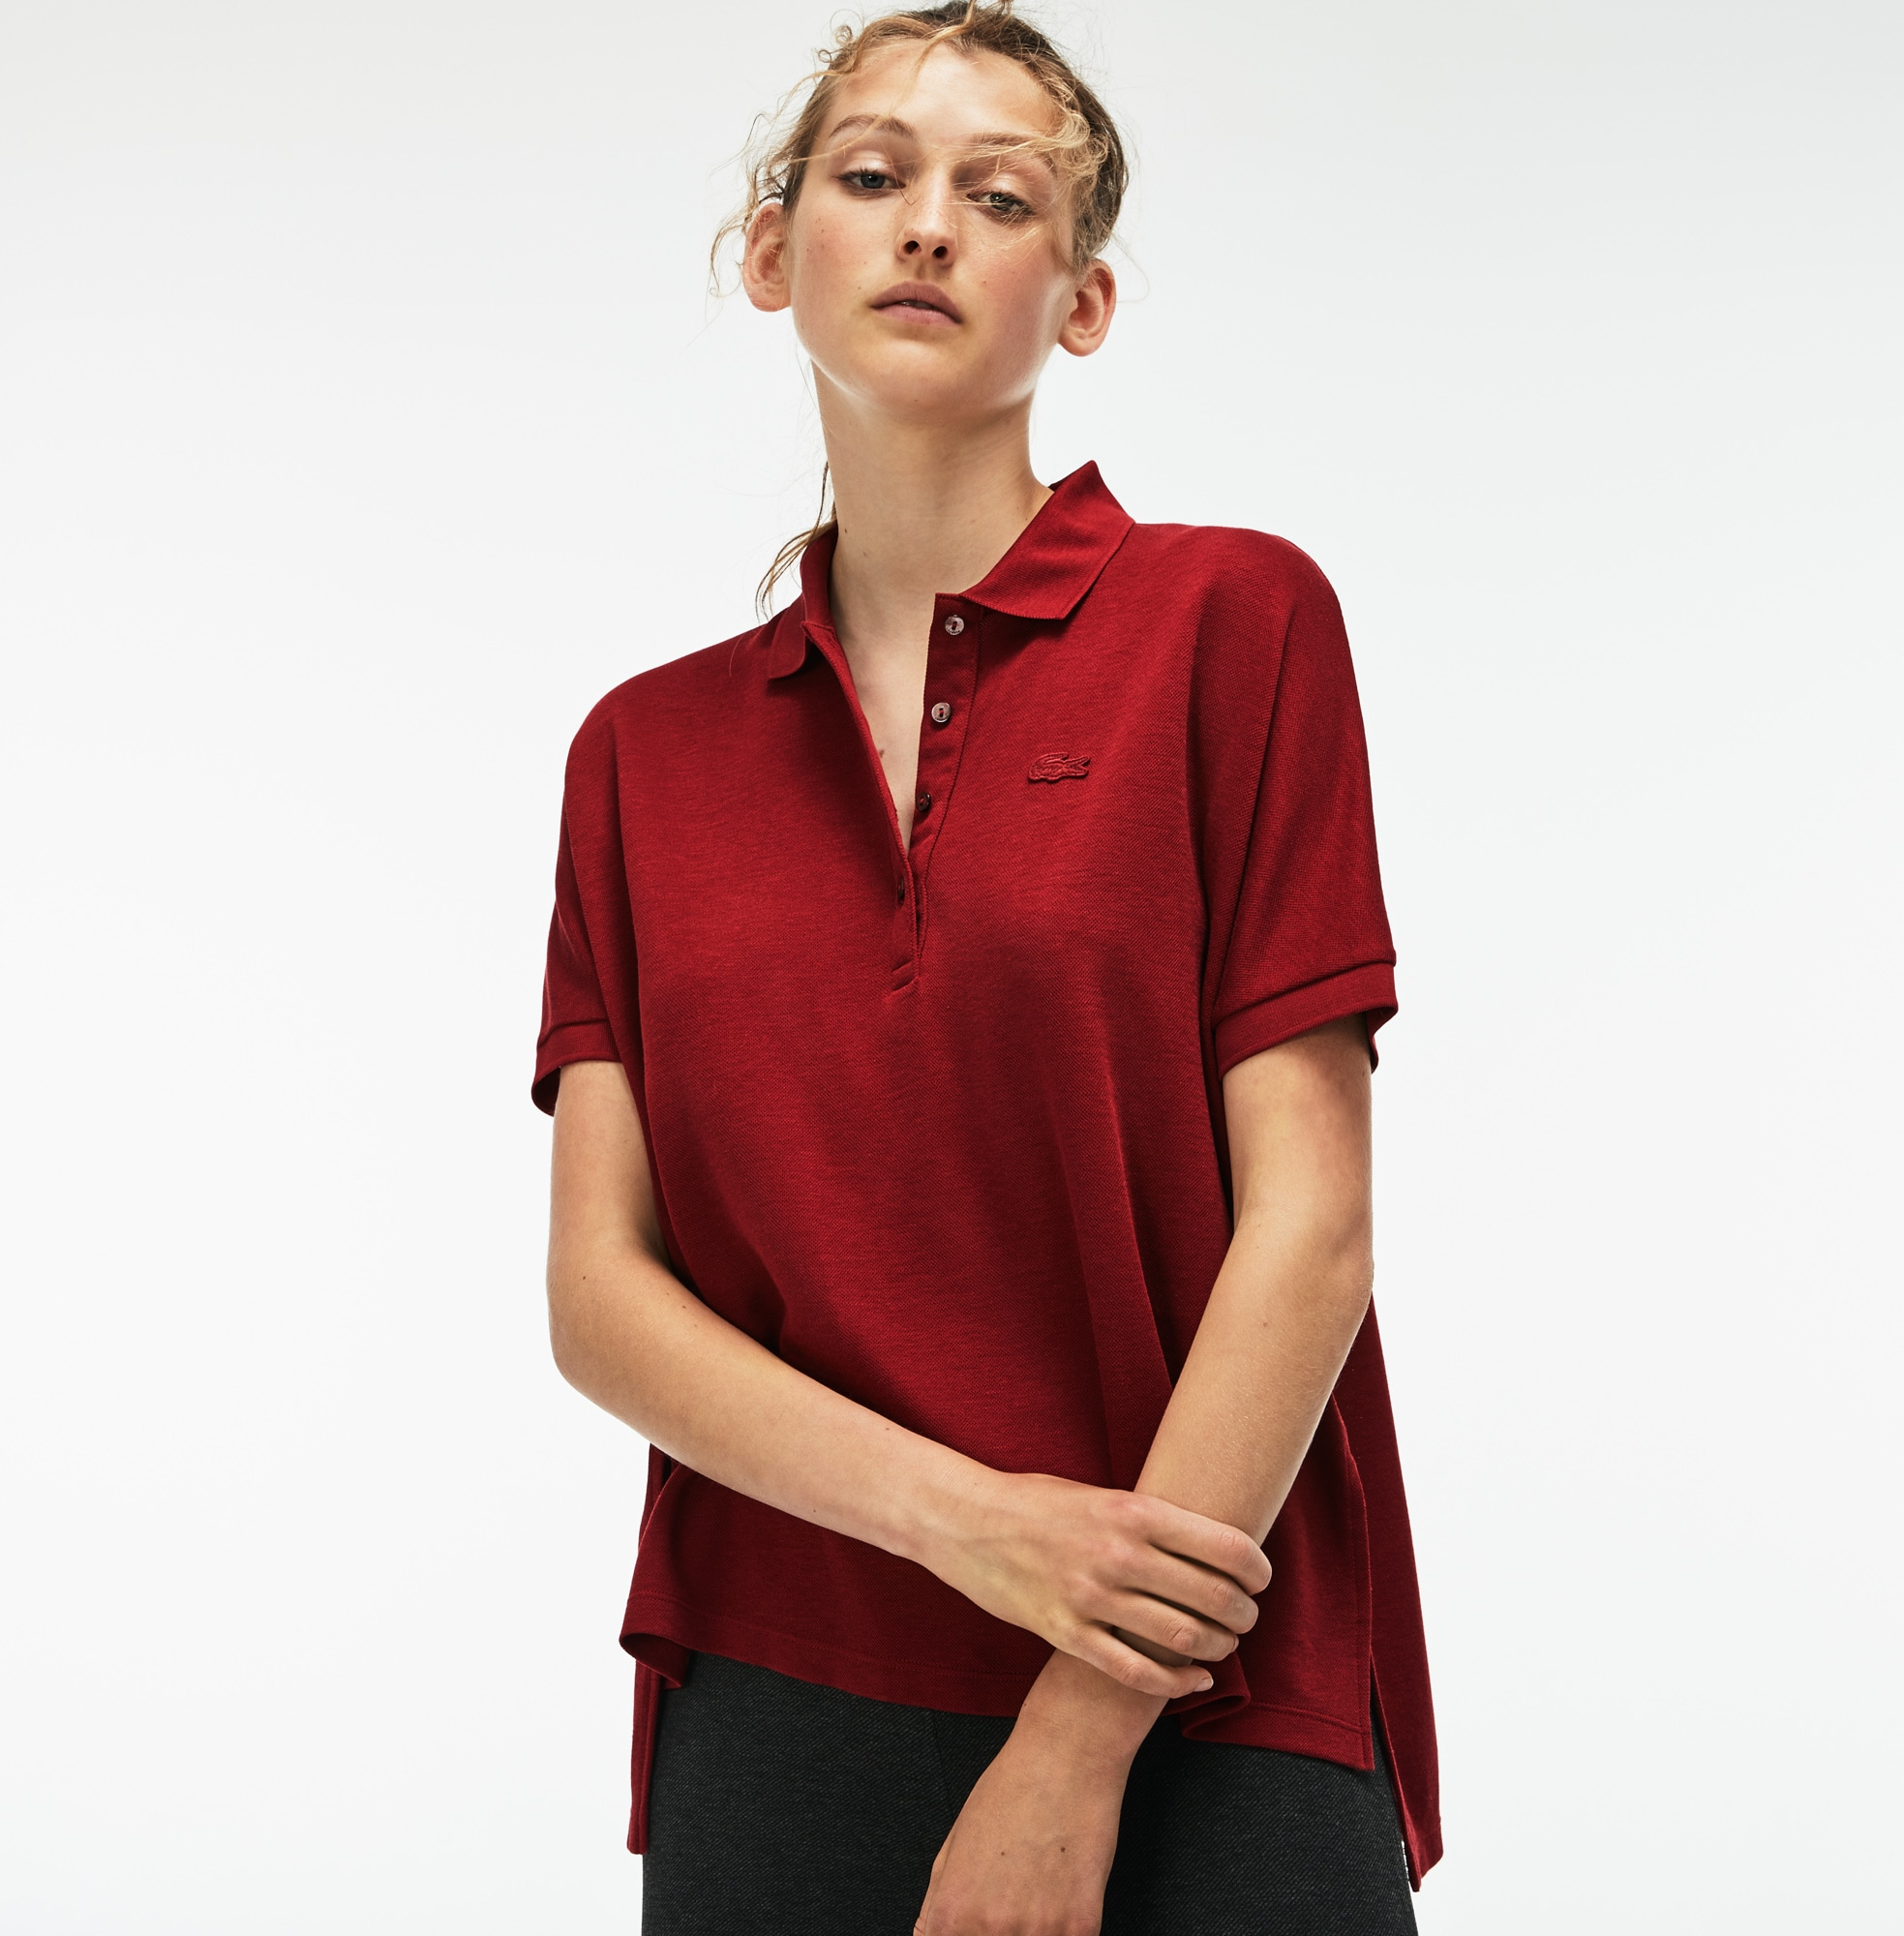 df5c410a2a Lacoste Womens Polo Shirts - DREAMWORKS